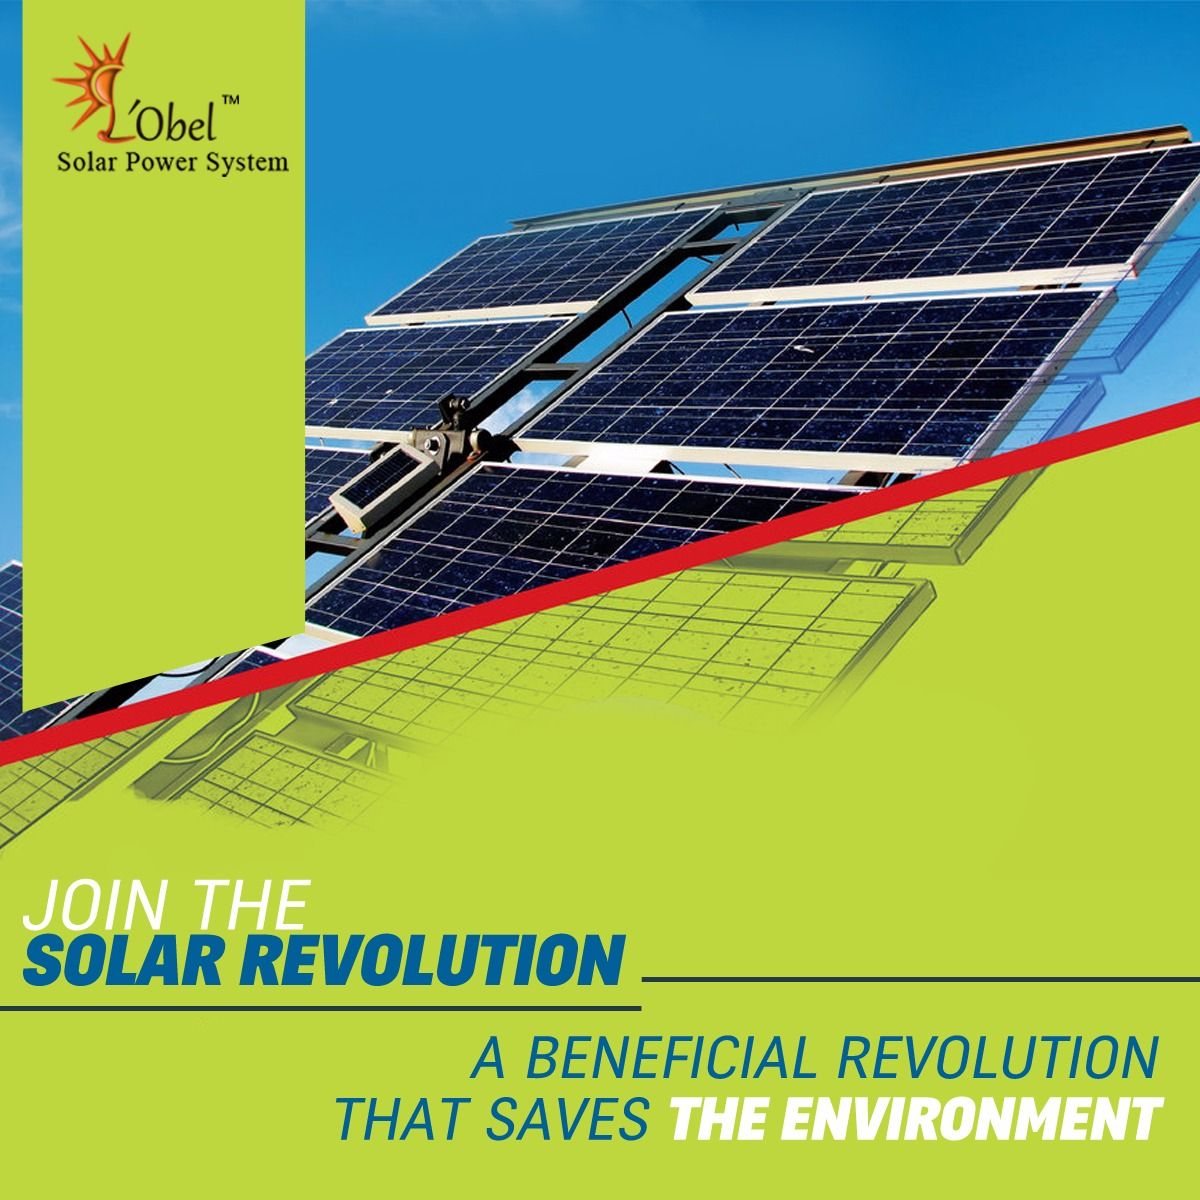 Idea by lobel solar power system on lobel solar power